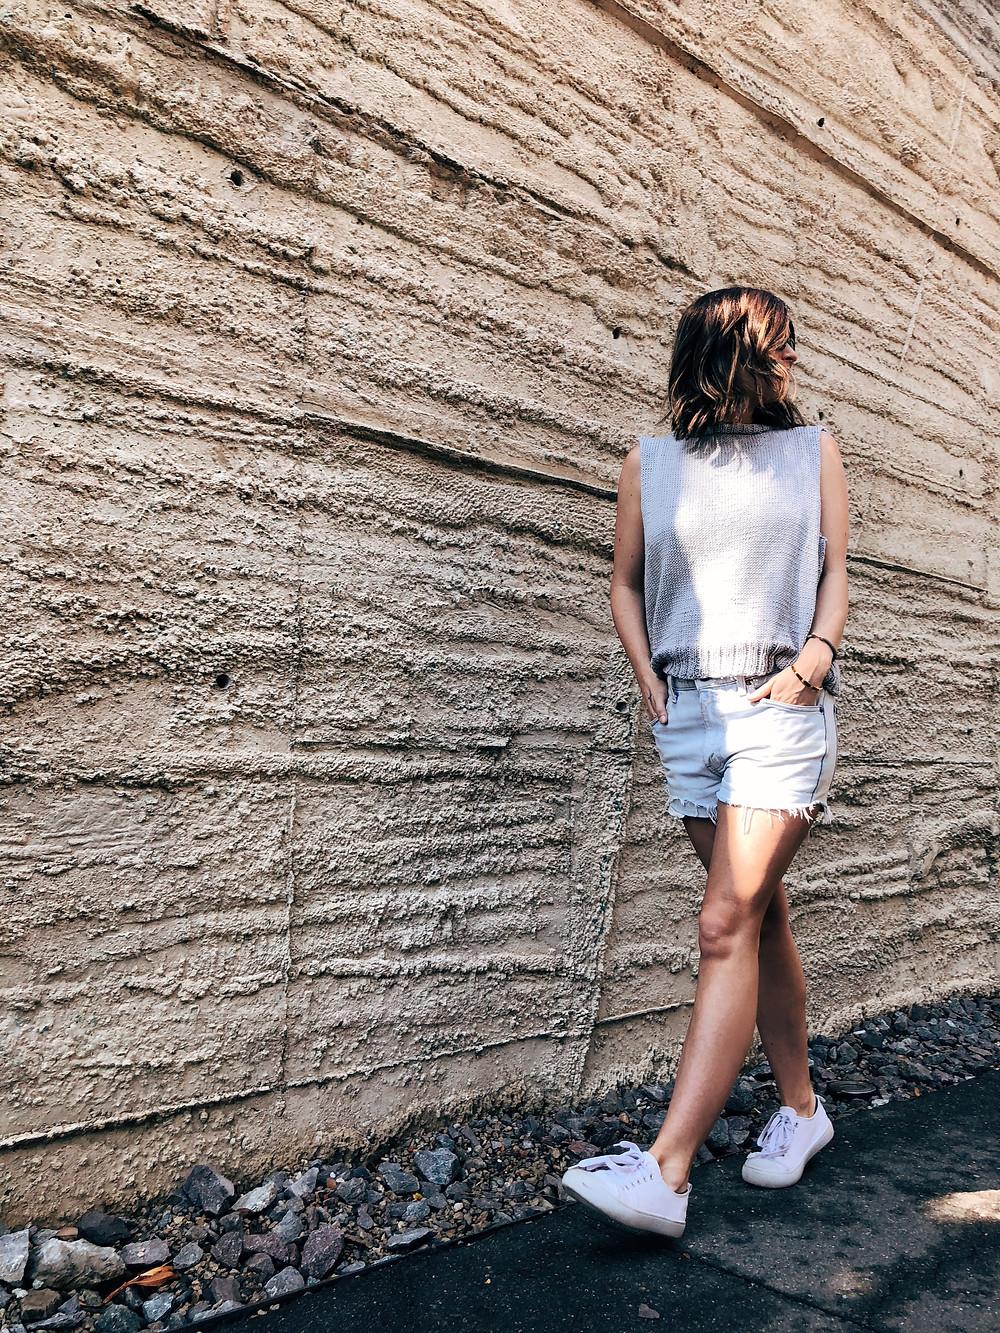 Revel Knitwear Ethical Fashion Australia